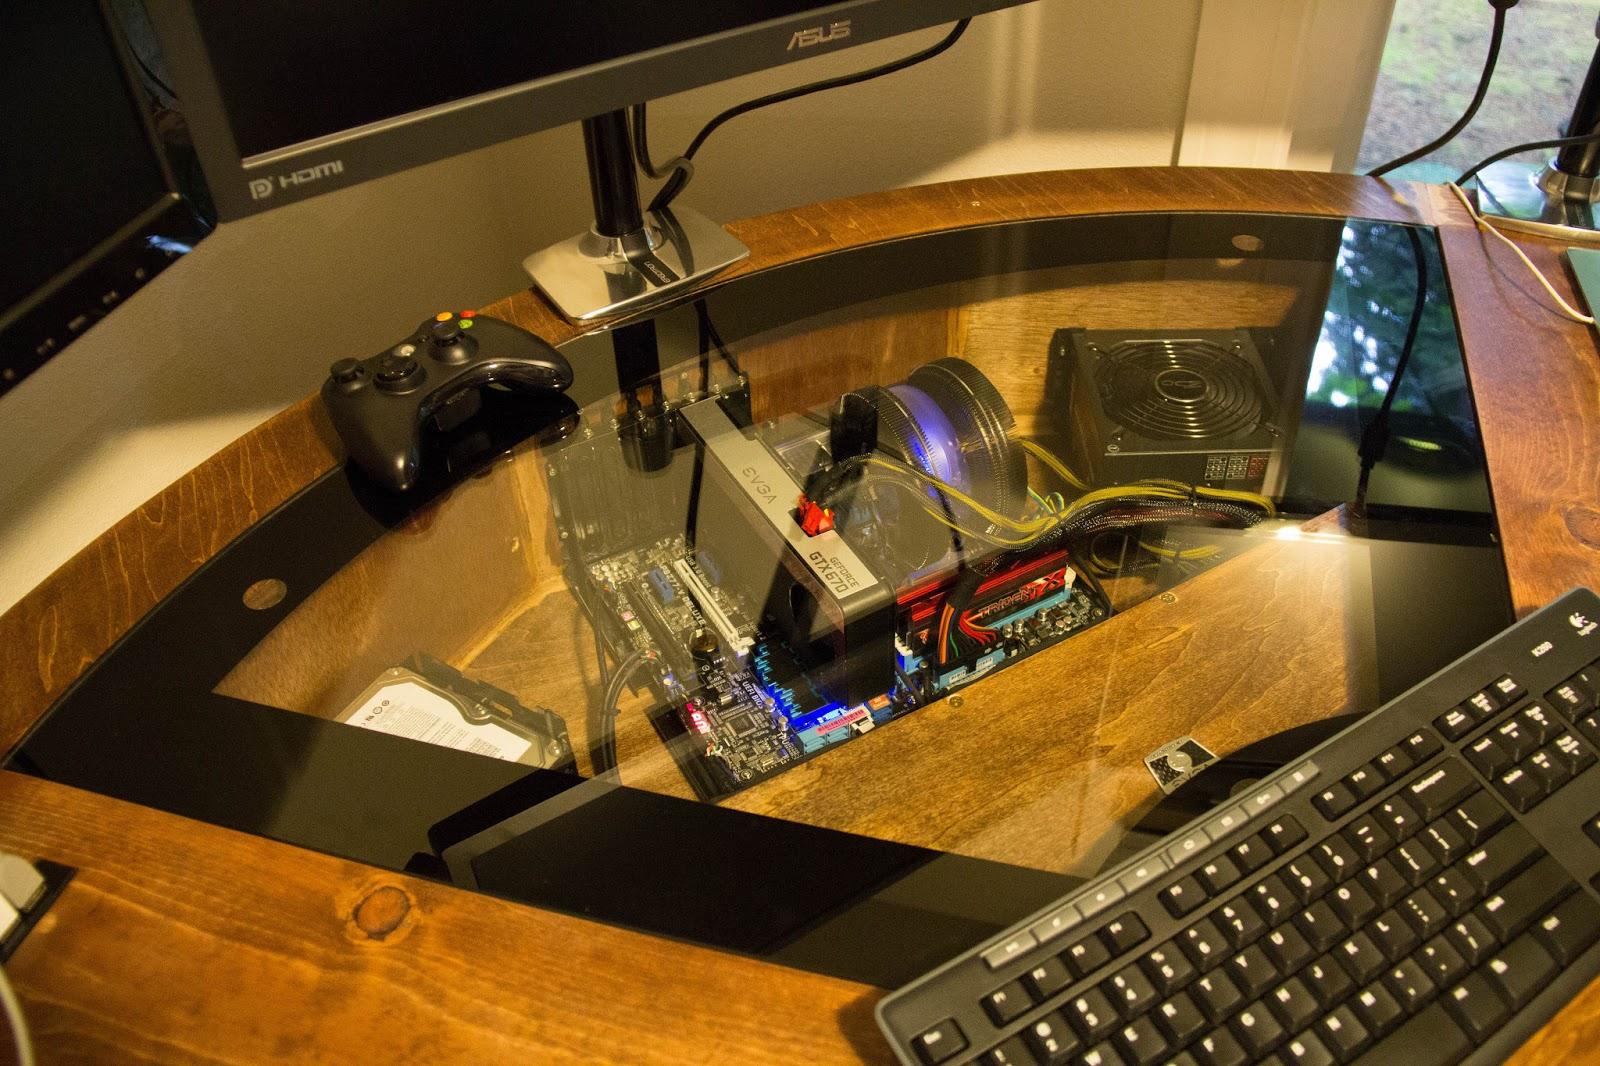 Loren\u0027s Projects: The Computer Desk